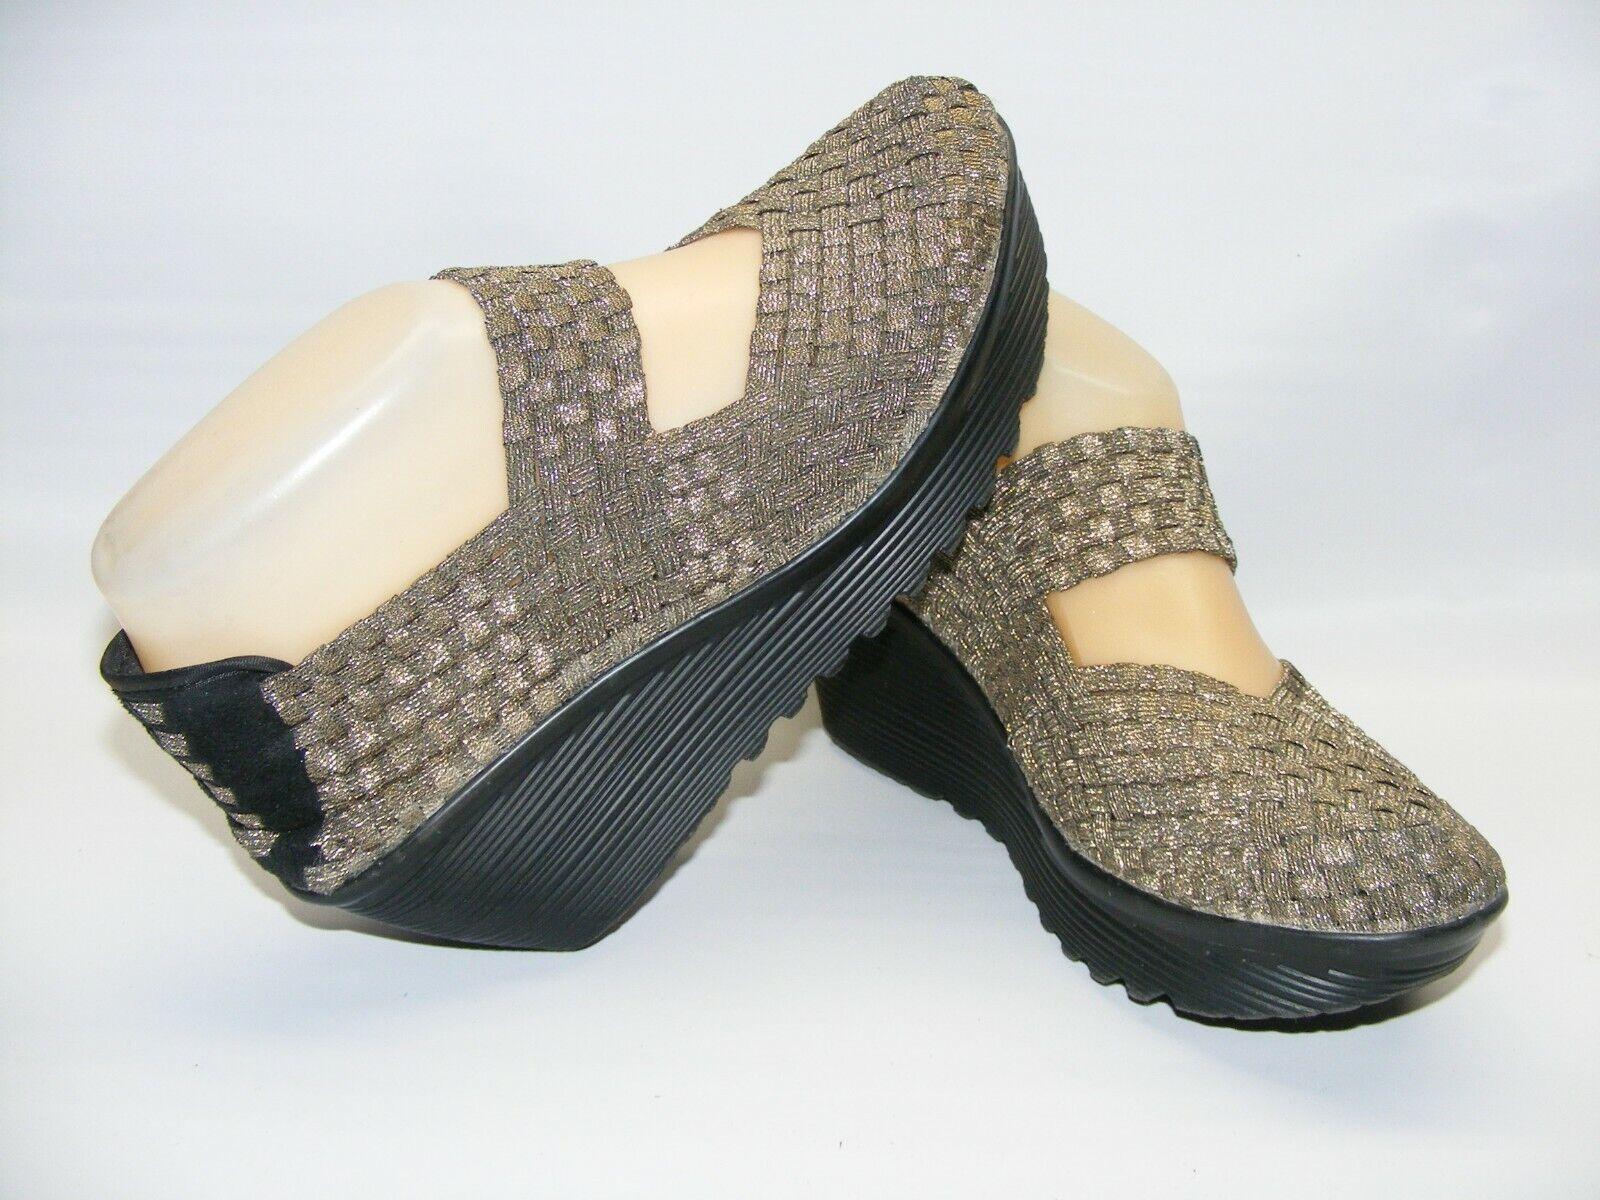 St Johns Bay Women's 6.5 M Woven Gold Bronze Slip On Shoes 2.5